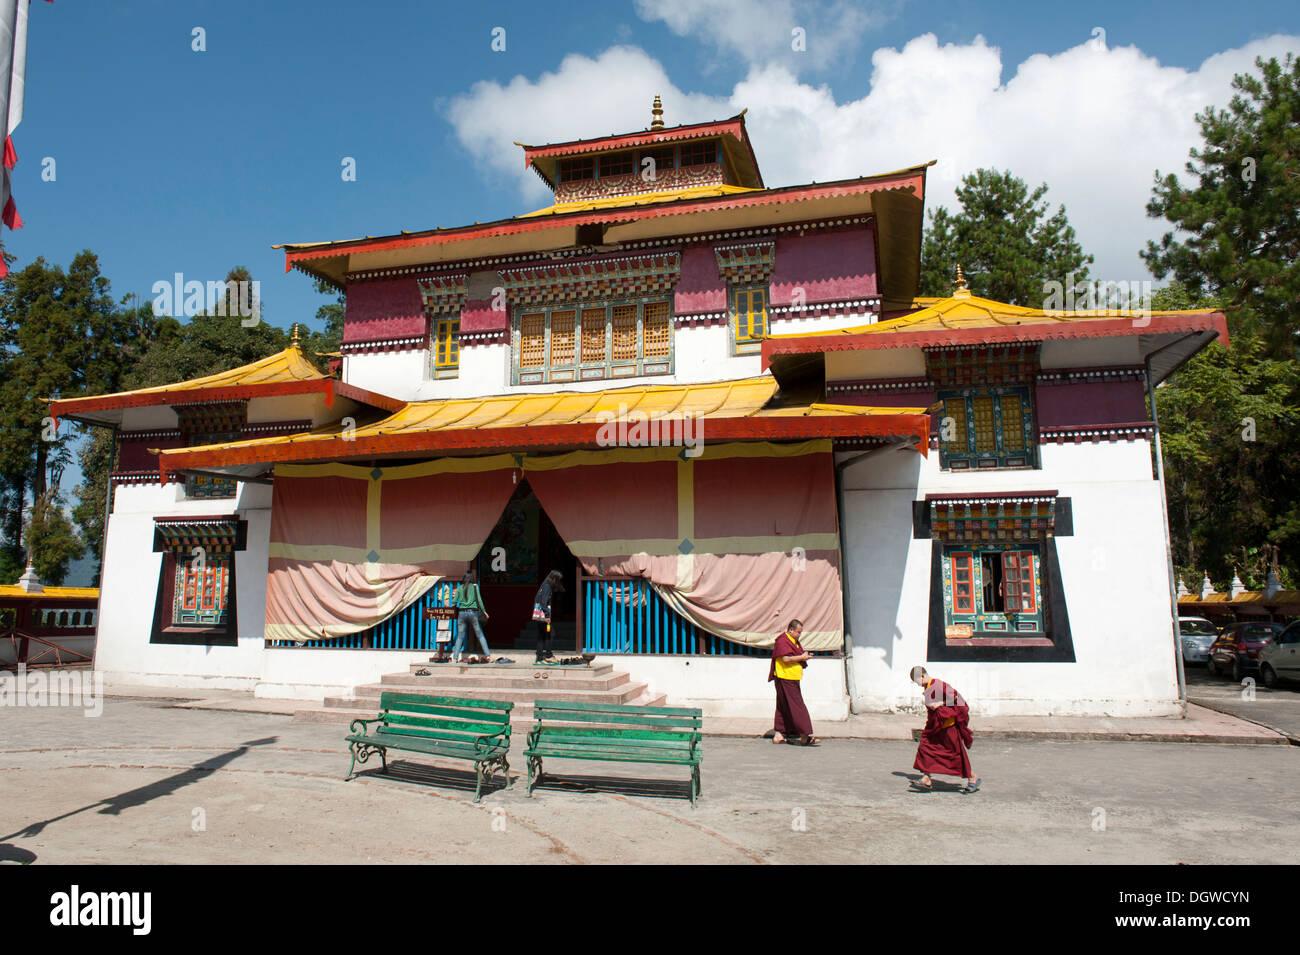 Tibetan Buddhism, Enchey Gompa Monastery, Gangtok, Sikkim, Himalayas, India, South Asia, Asia - Stock Image